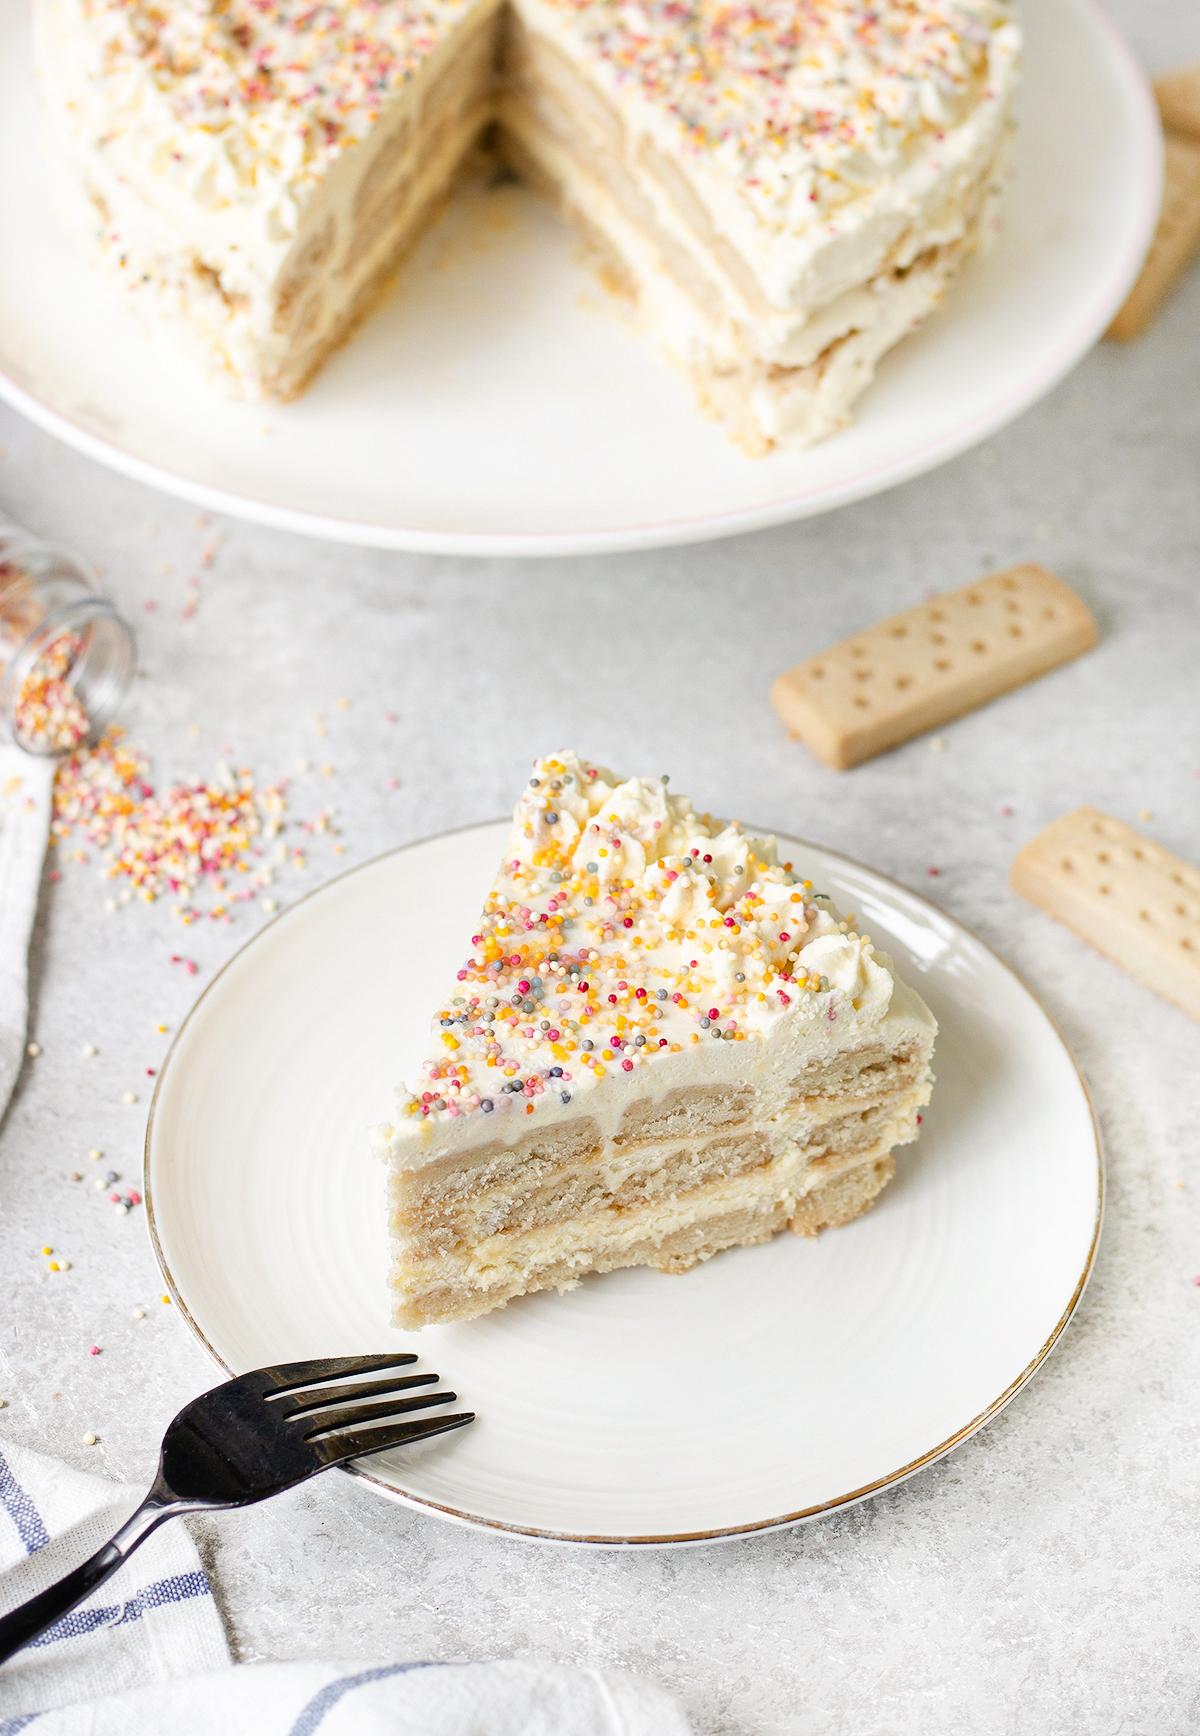 one slice of icebox cake